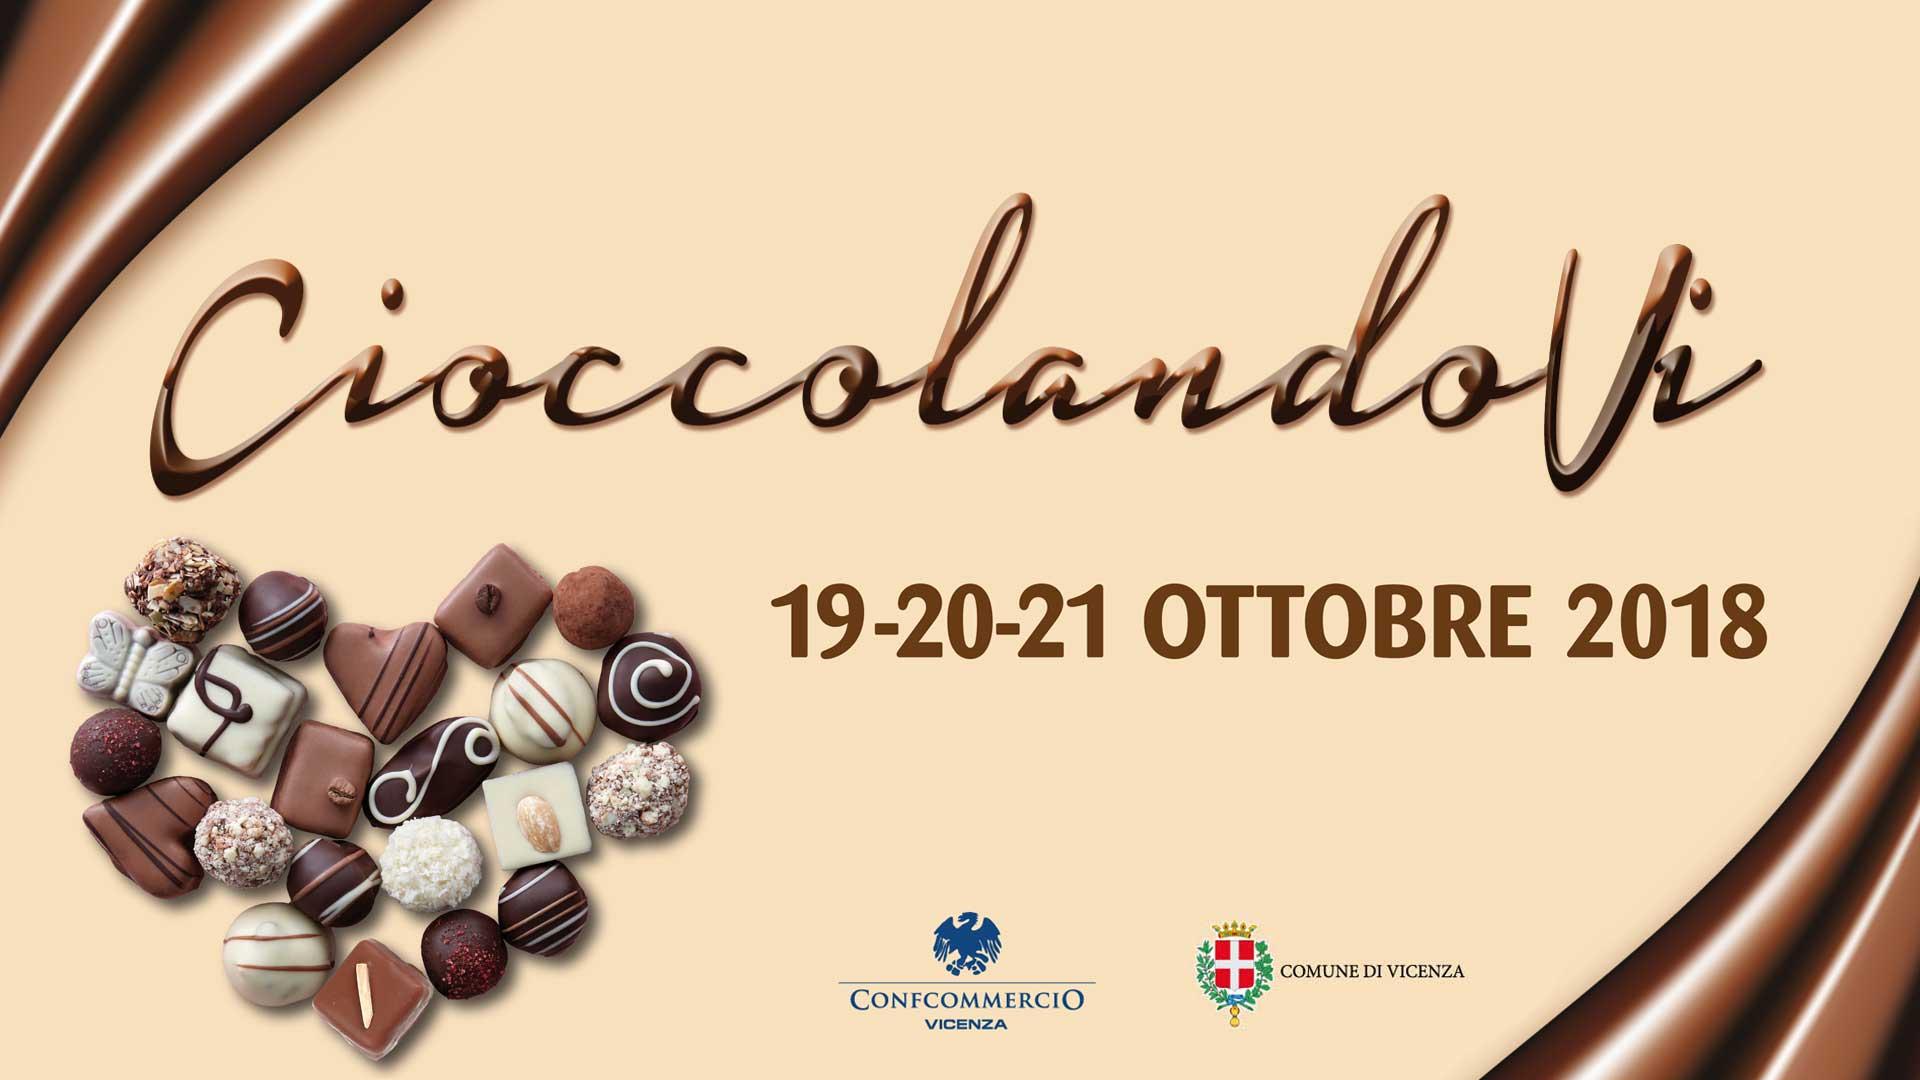 Cioccolandovi Vicenza 2018